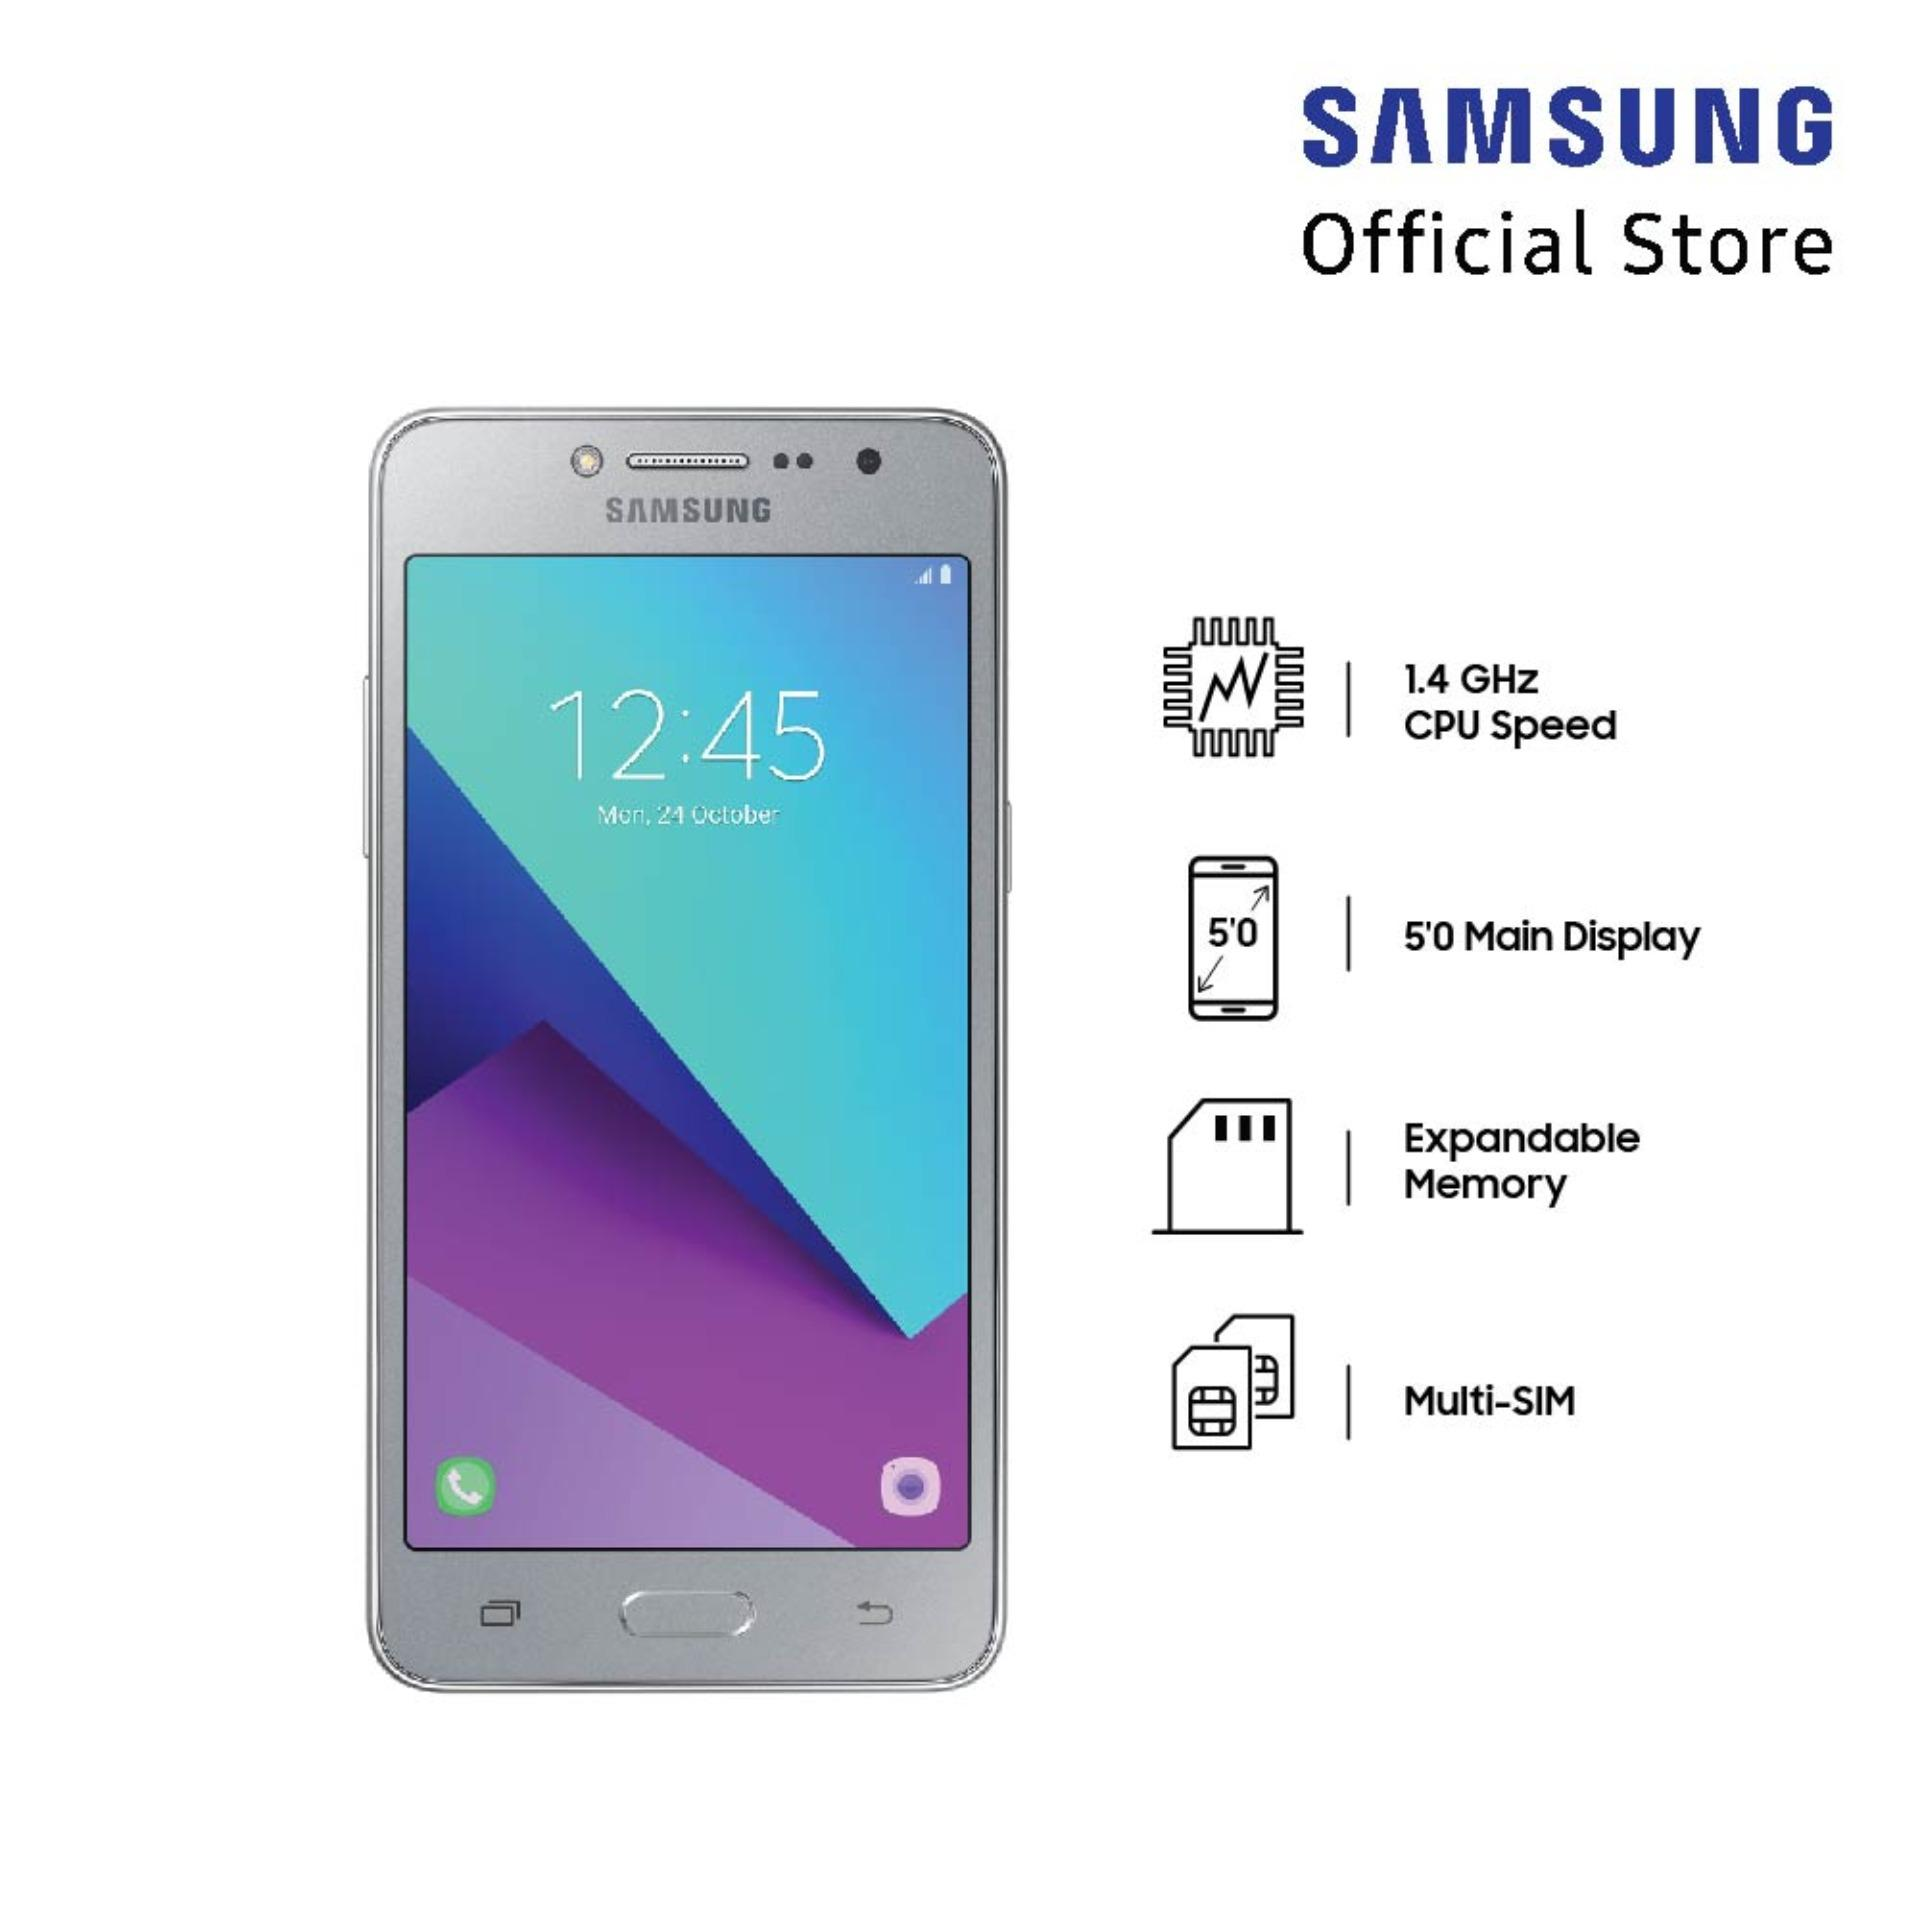 Samsung Galaxy J2 Prime Silver 1.5/8 GB